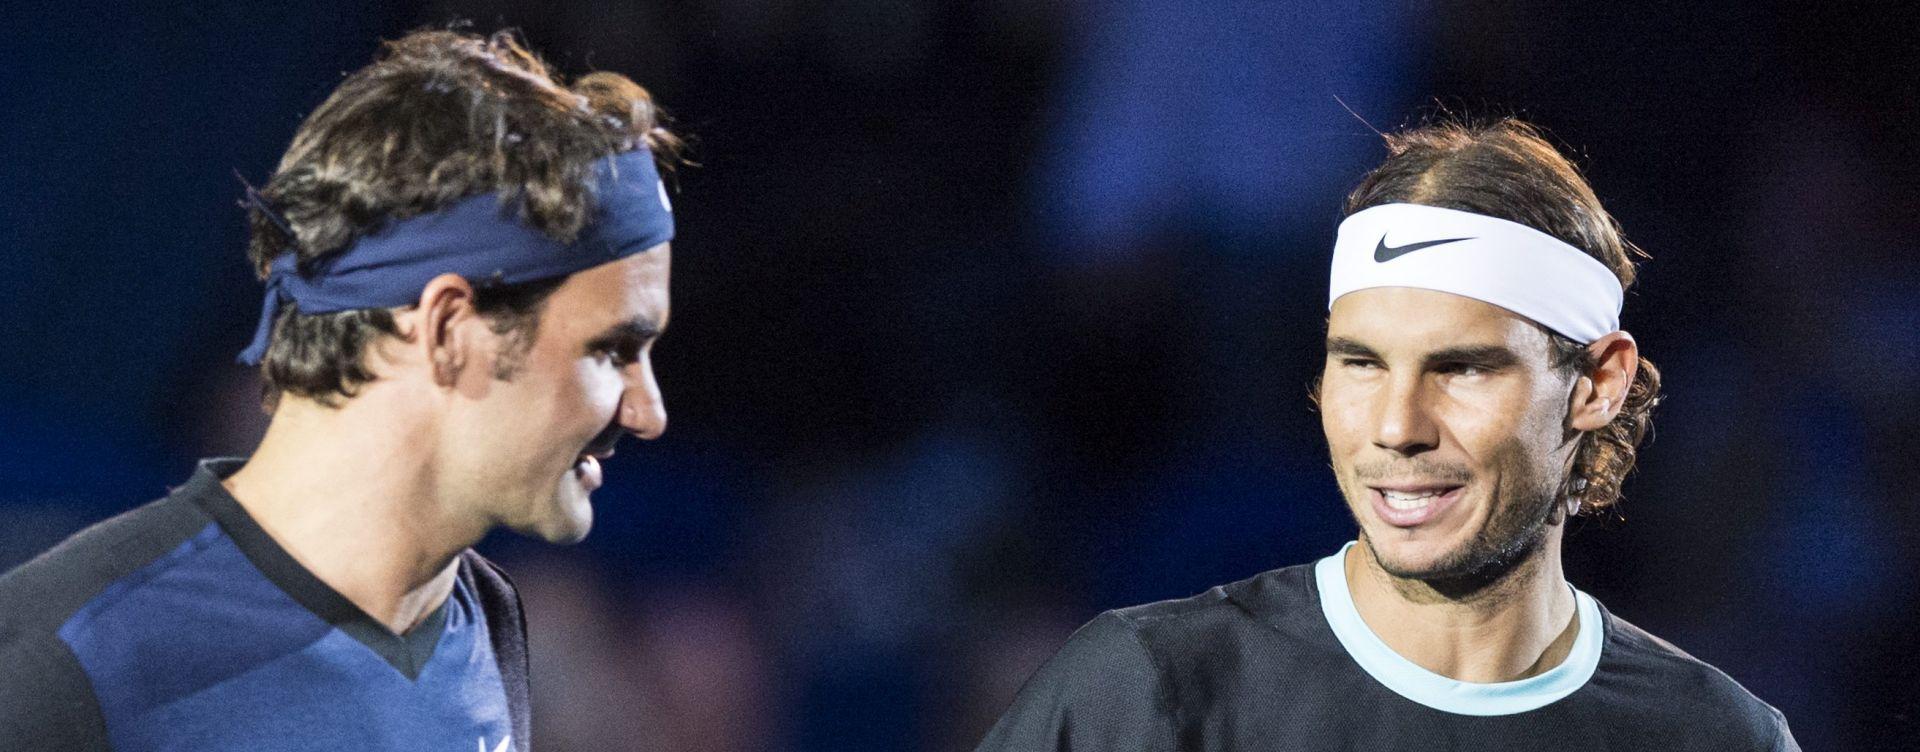 TENISKI KLASIK: Federer u Baselu bolji od Nadala